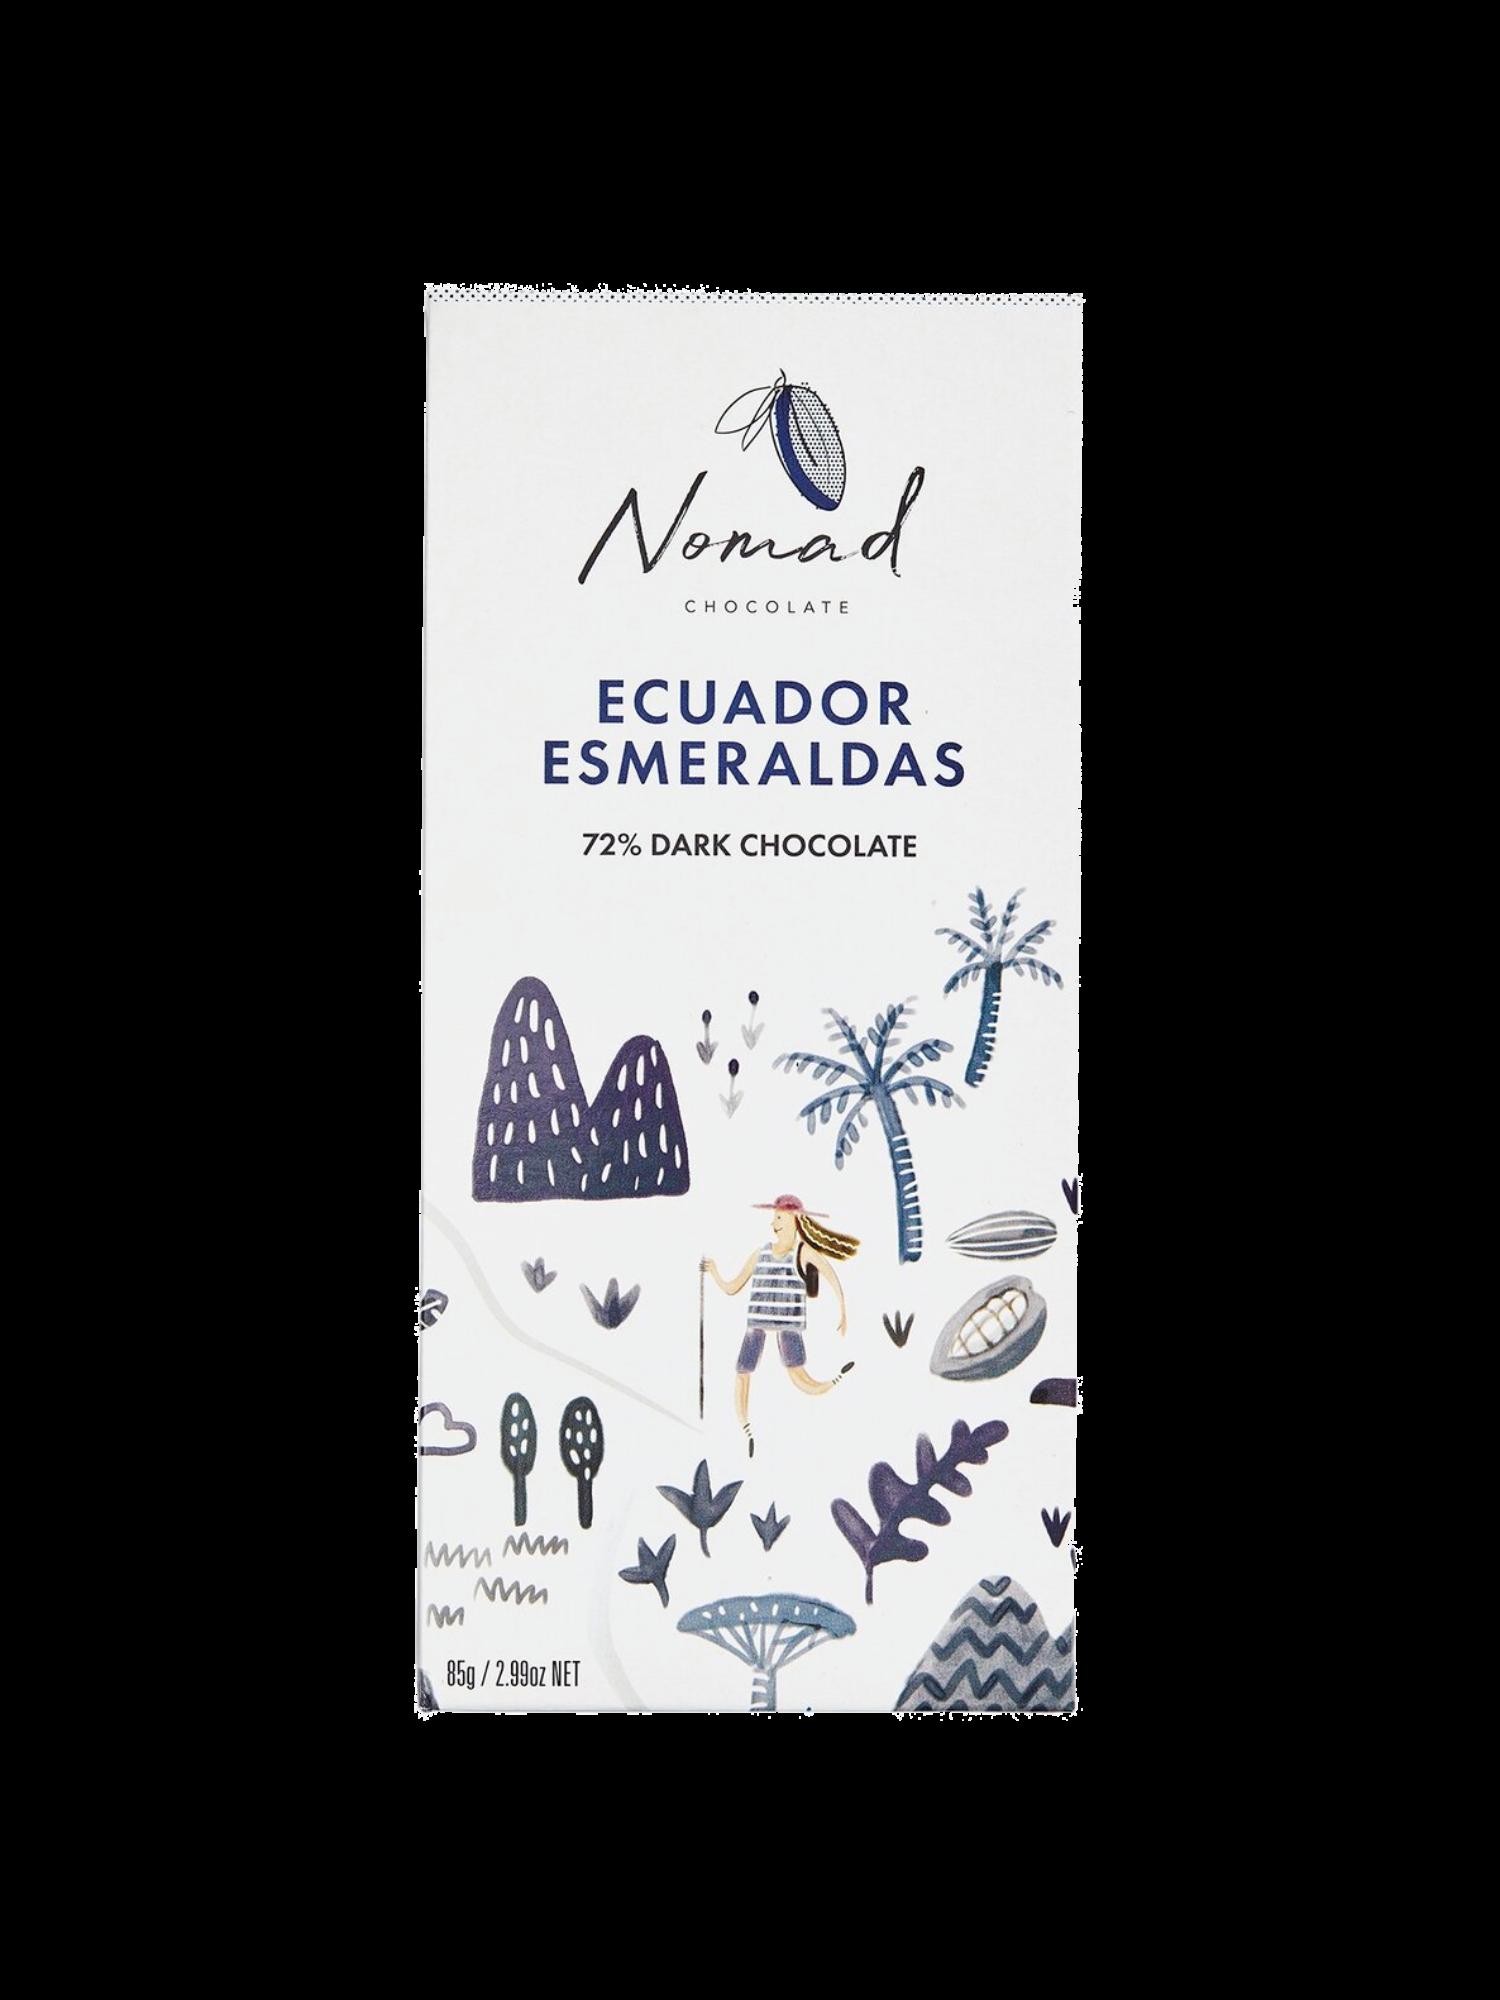 Nomad Chocolate Ecuador 72% Dark Chocolate Bar